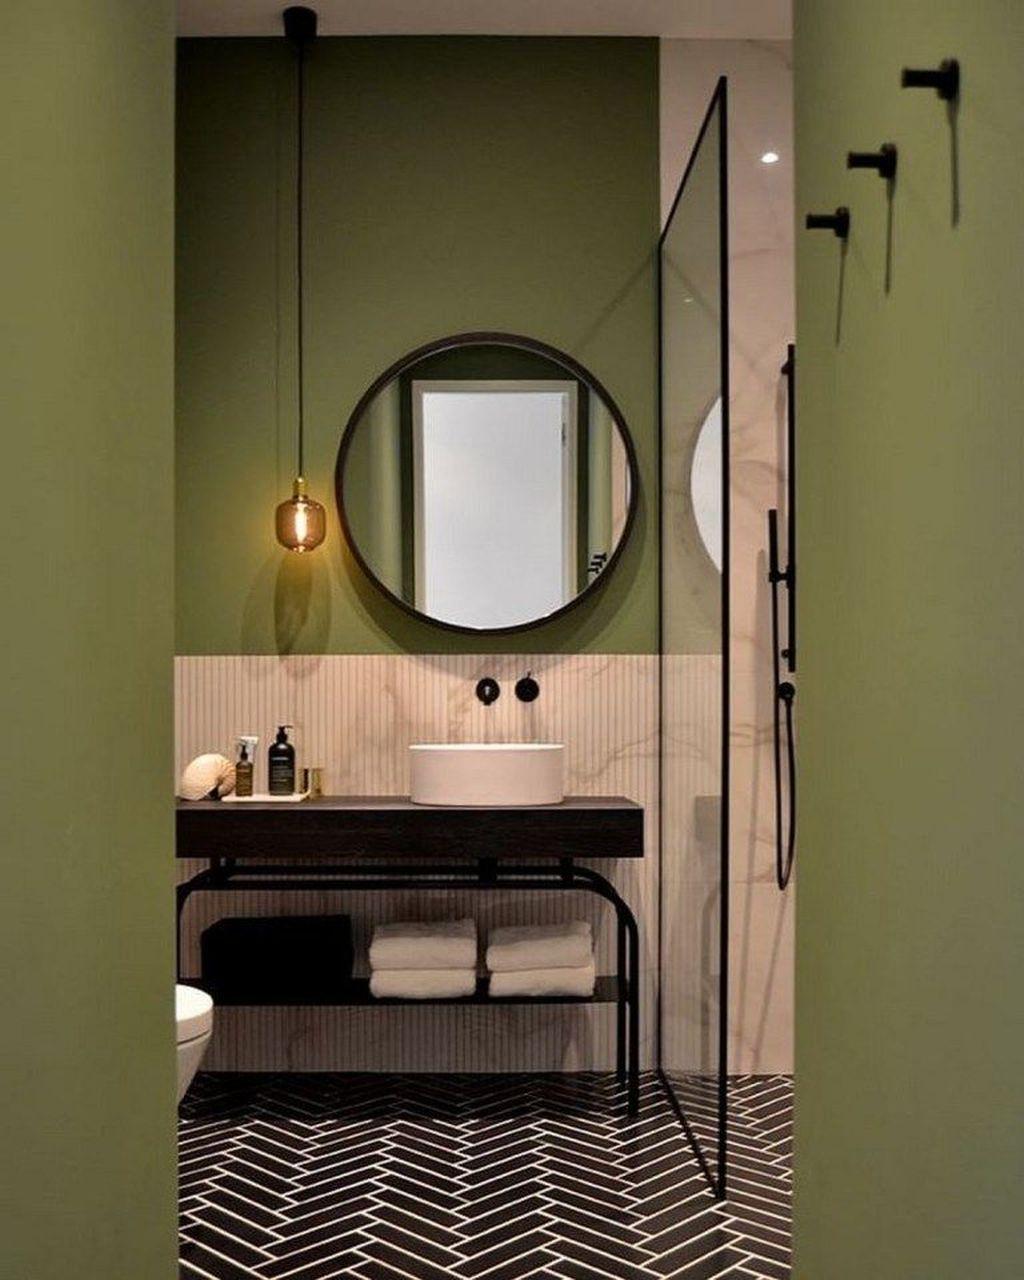 Unusual Bathroom Design Ideas You Need To Know 35